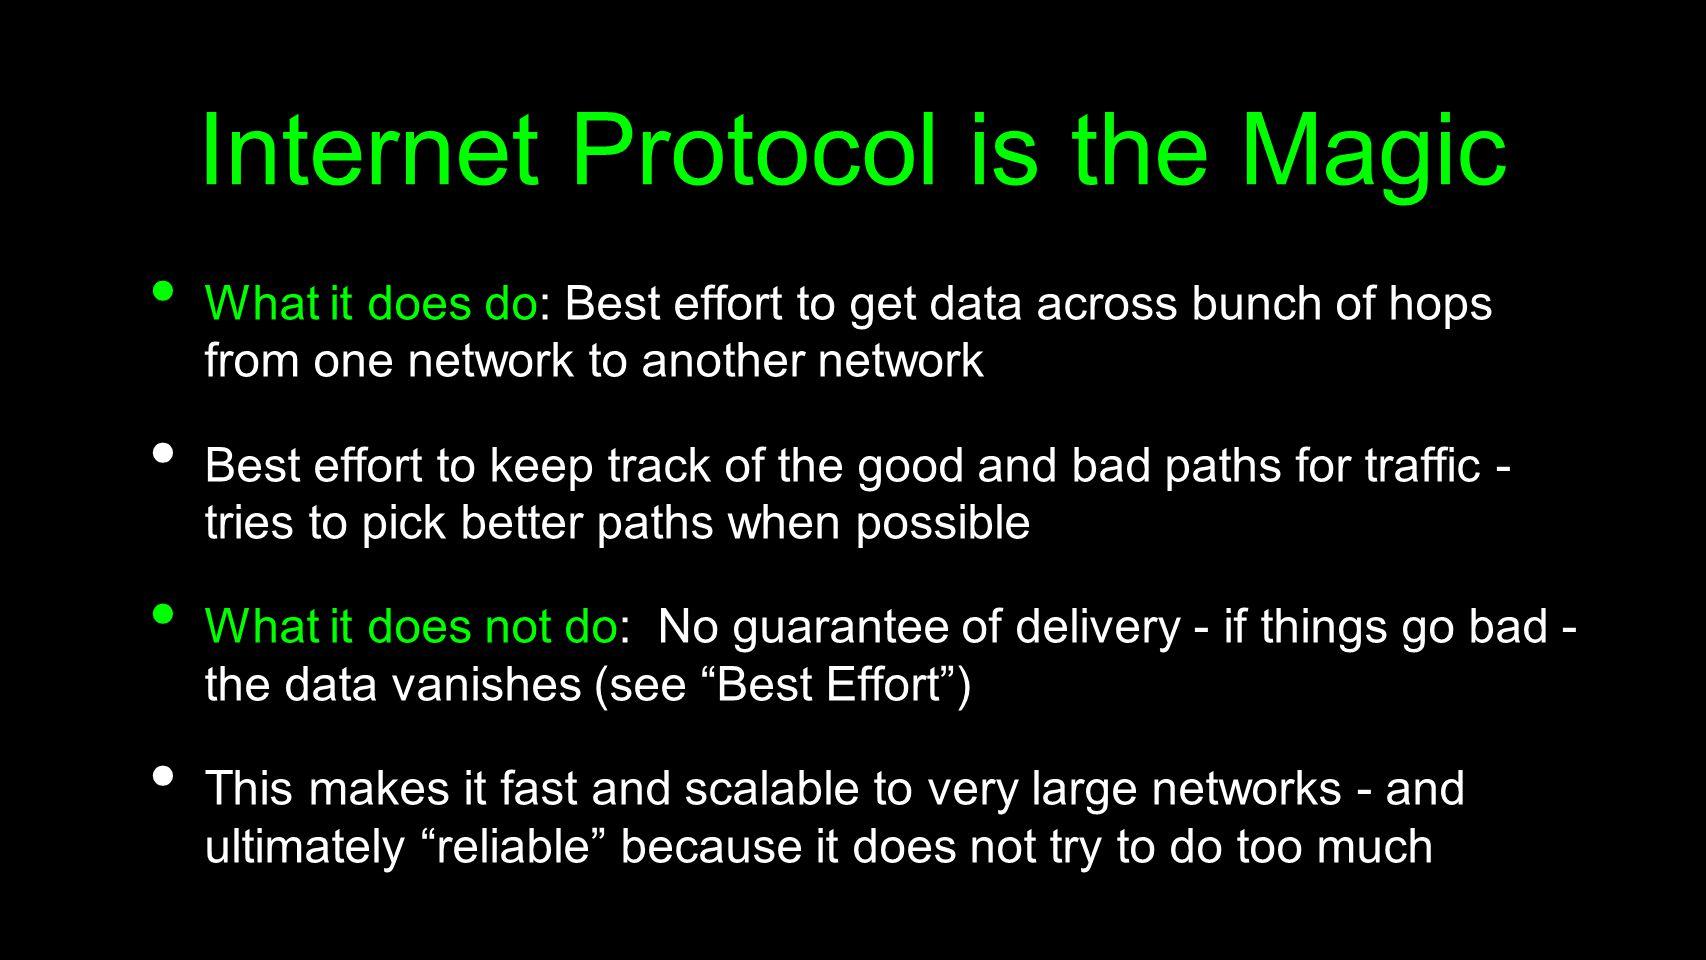 Internet Protocol is the Magic